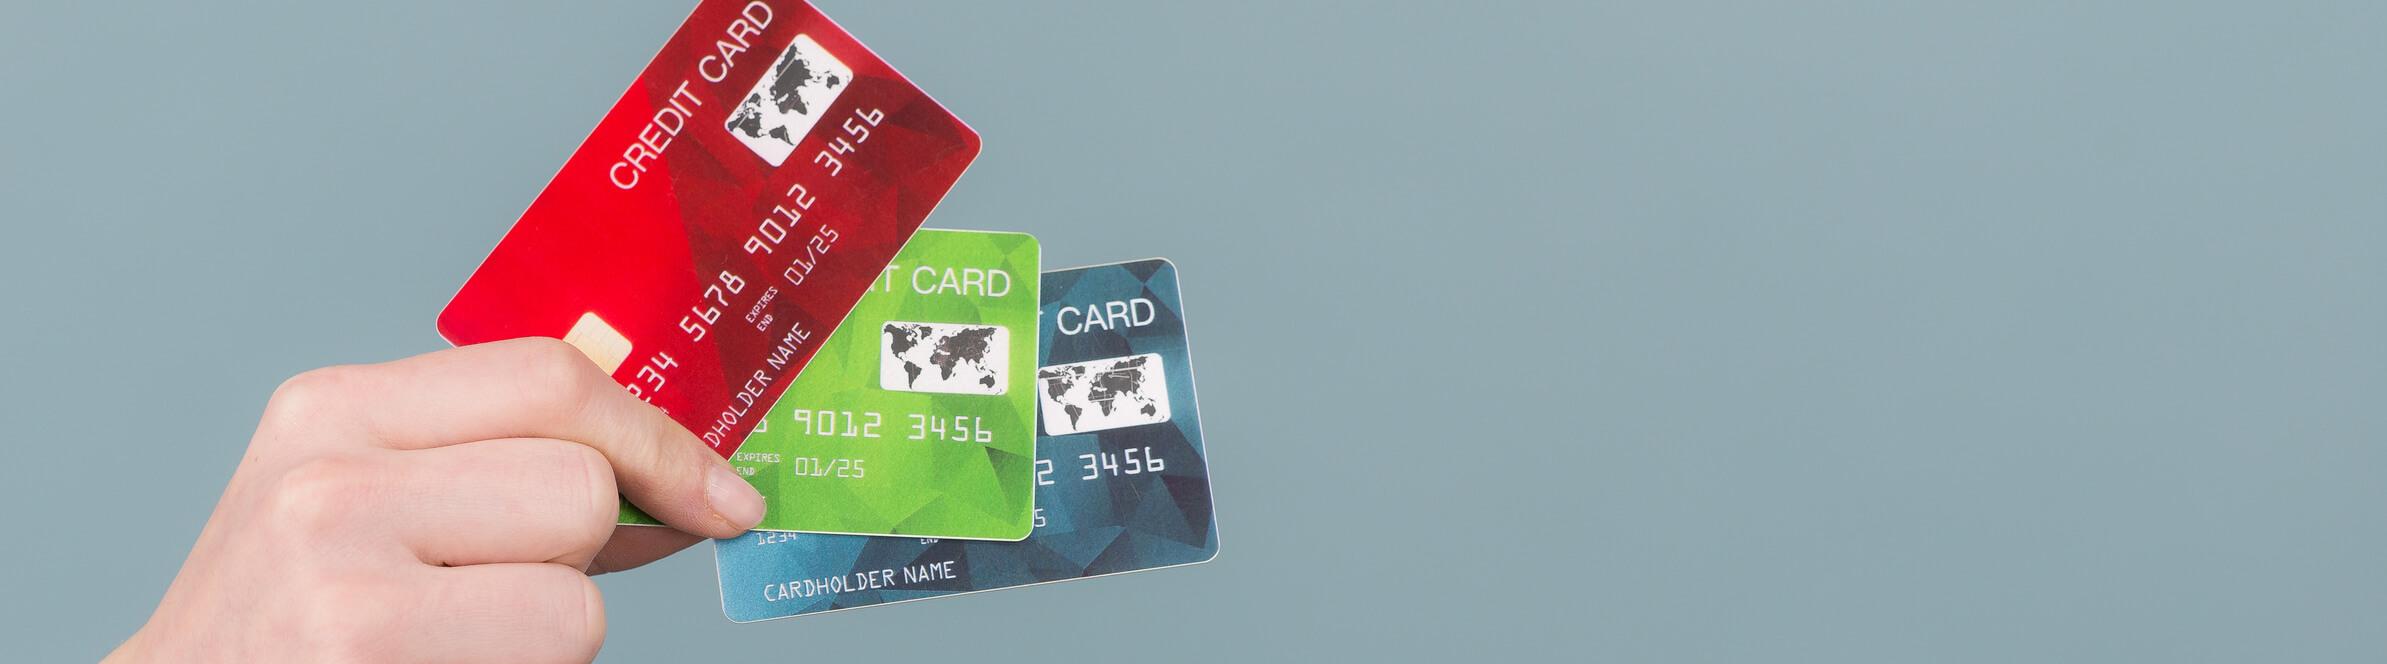 Cvv Ec Karte Sparkasse.Kartenprüfnummer So Finden Sie Die Nummer Vorsicht Vor Betrug